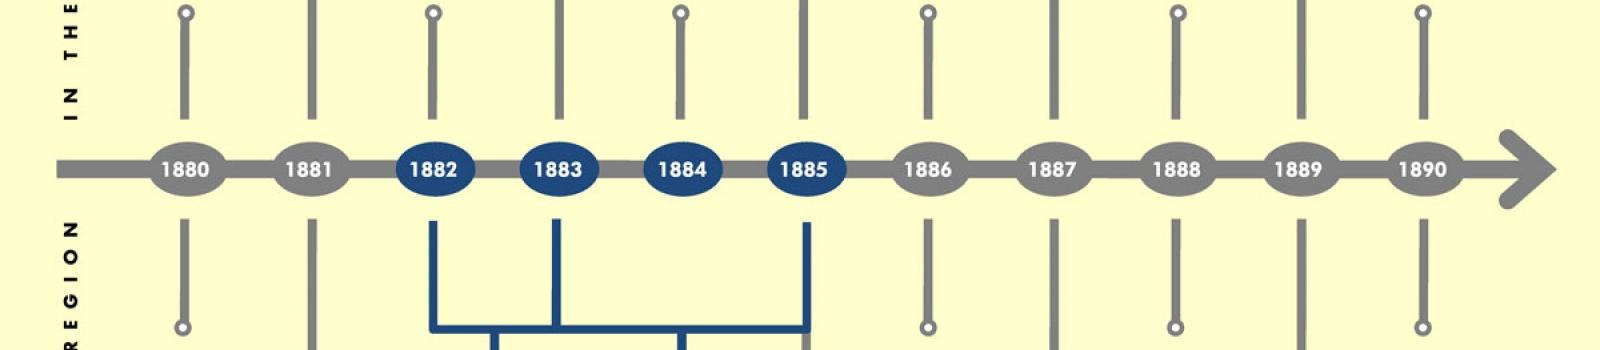 satplan_stellaland_events-timeline-1880-1890